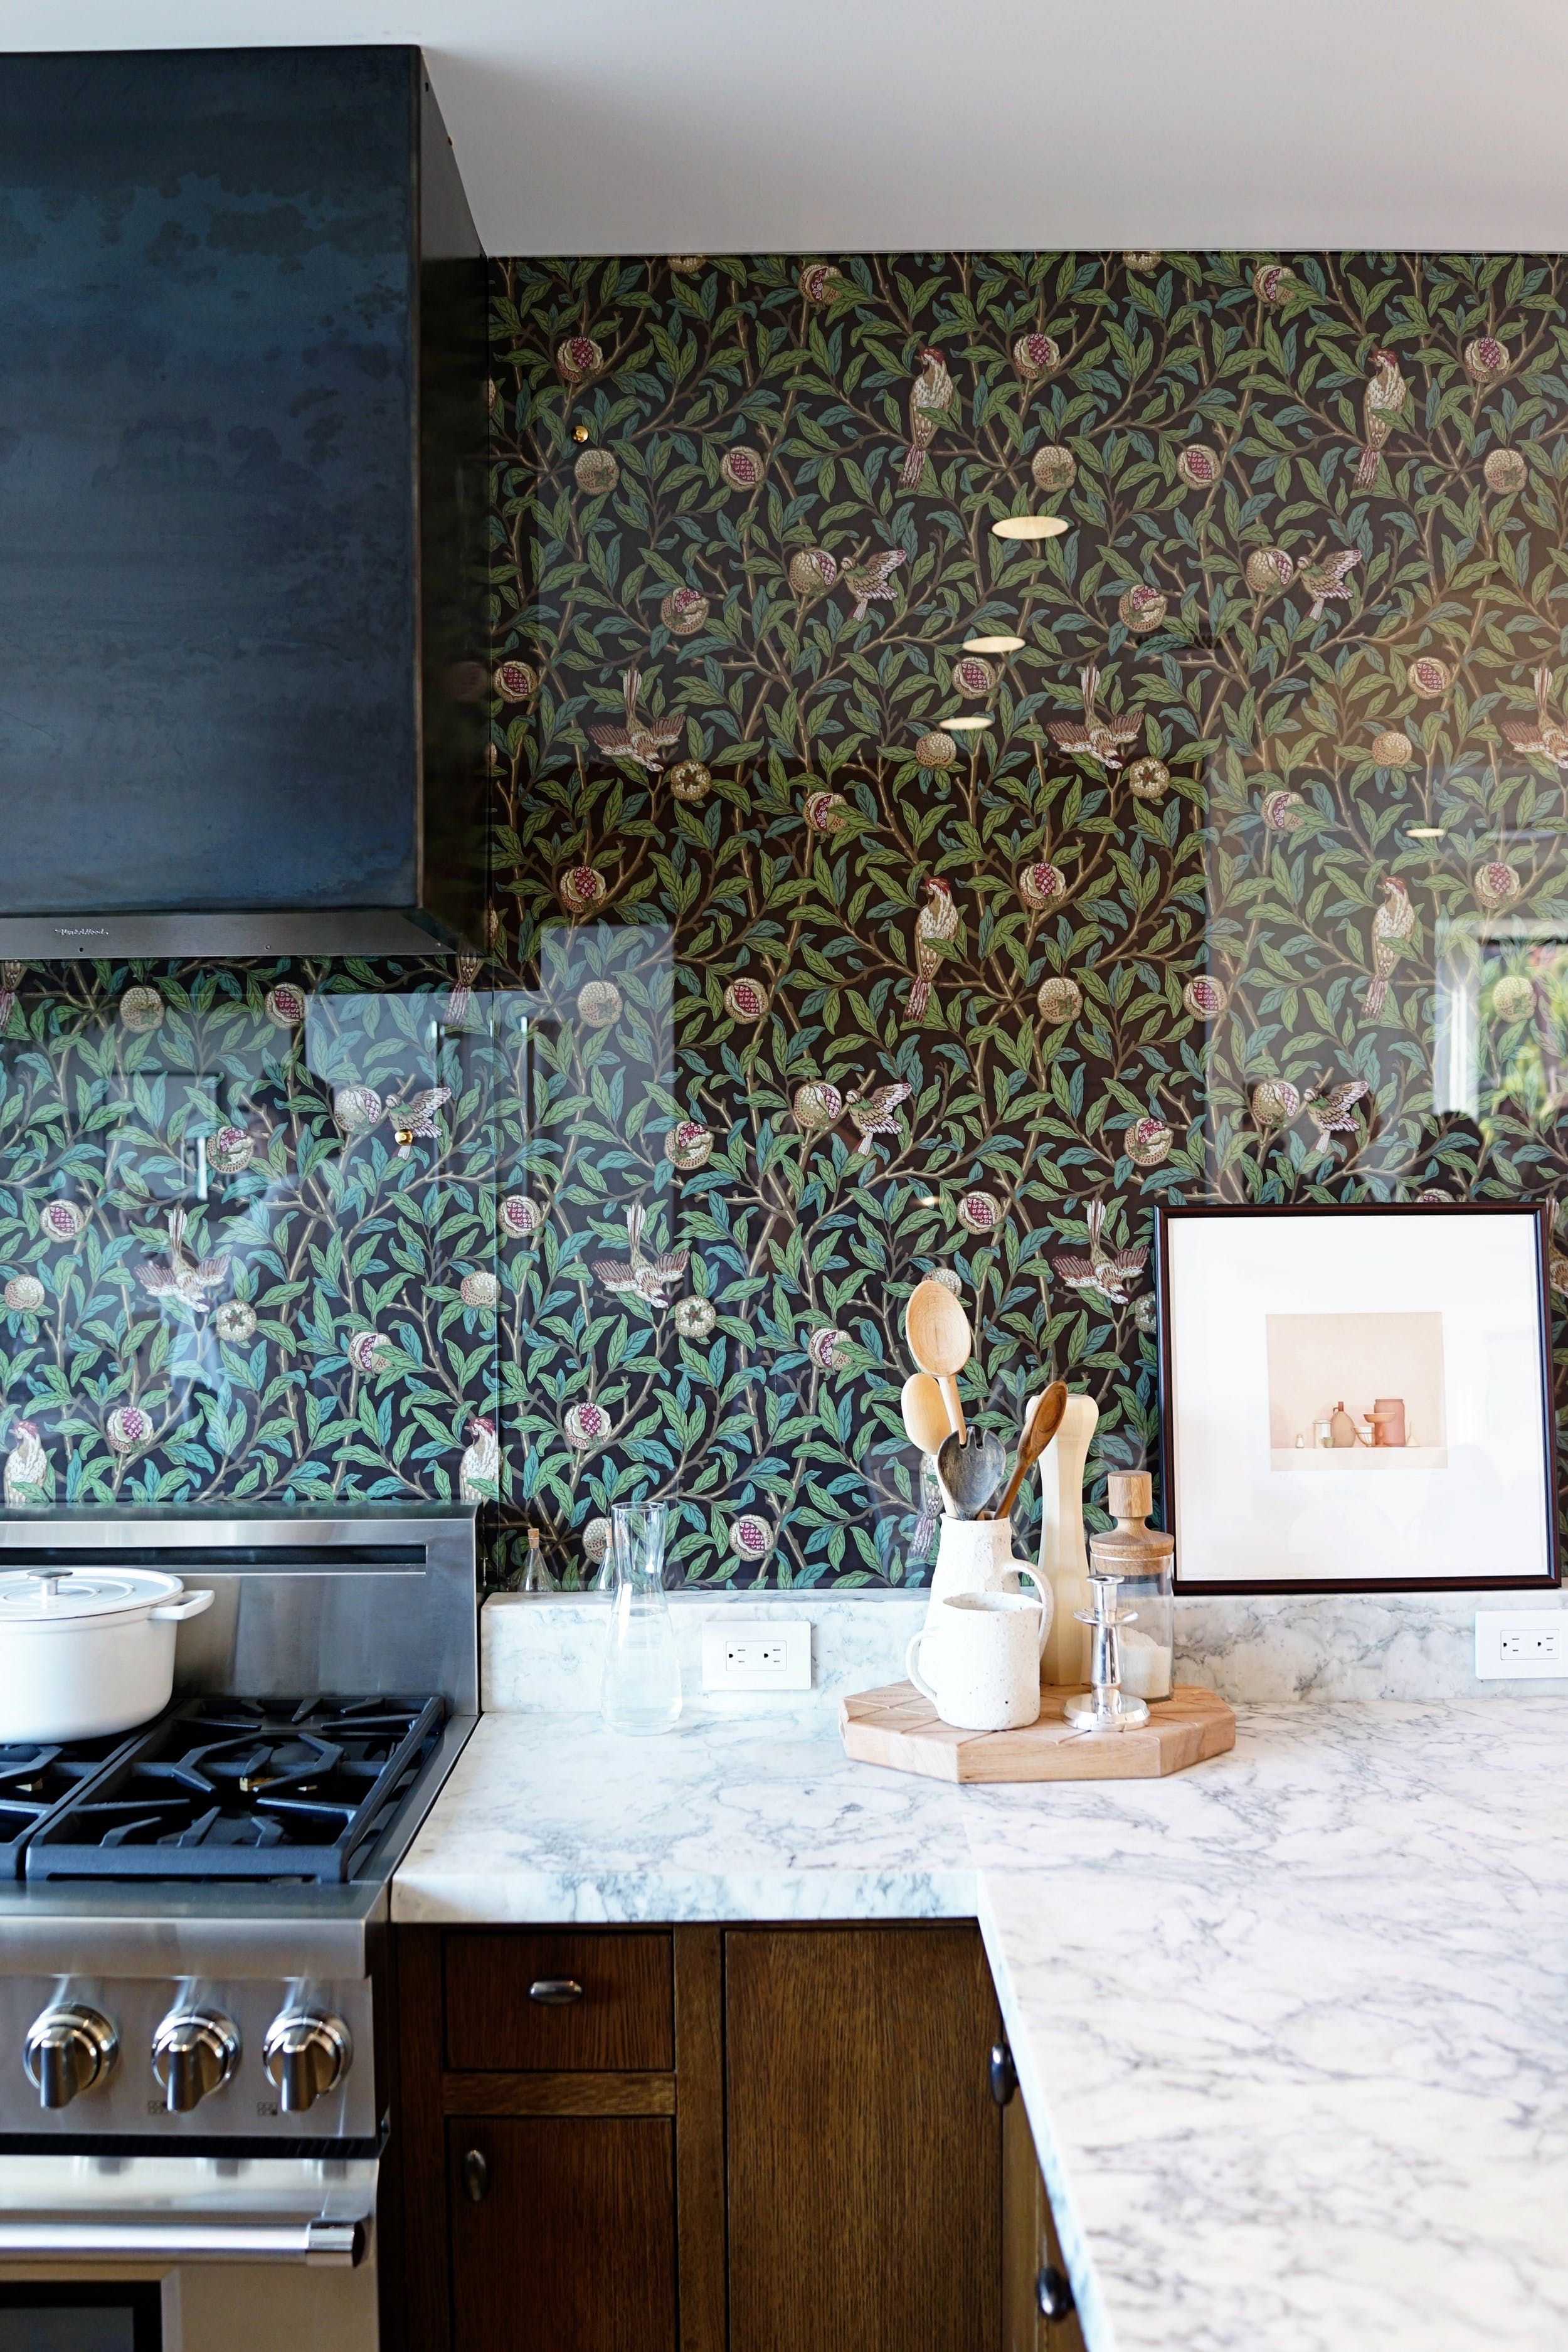 Out Of The Ordinary Backsplash Materials That Ll Make You Look Twice Backsplash Wallpaper Kitchen Wallpaper Glass Backsplash